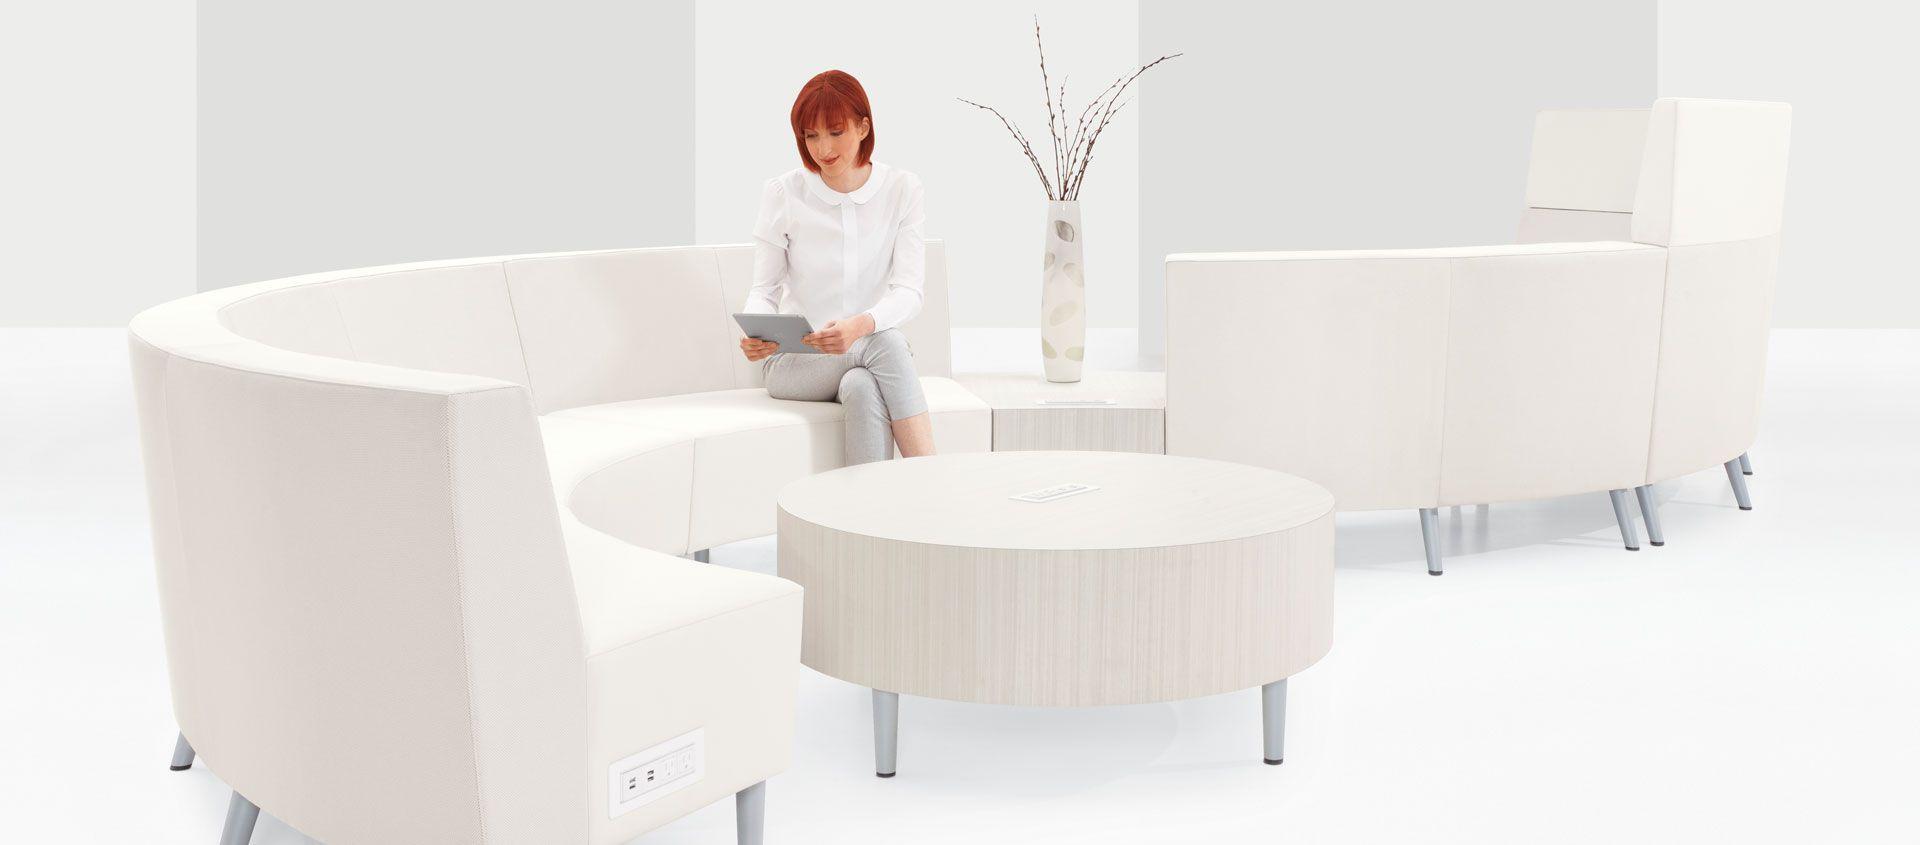 Lounge River Lindsey Office Furniture Lindseyfurniture Instagram Lindseysofficefurniture Houston